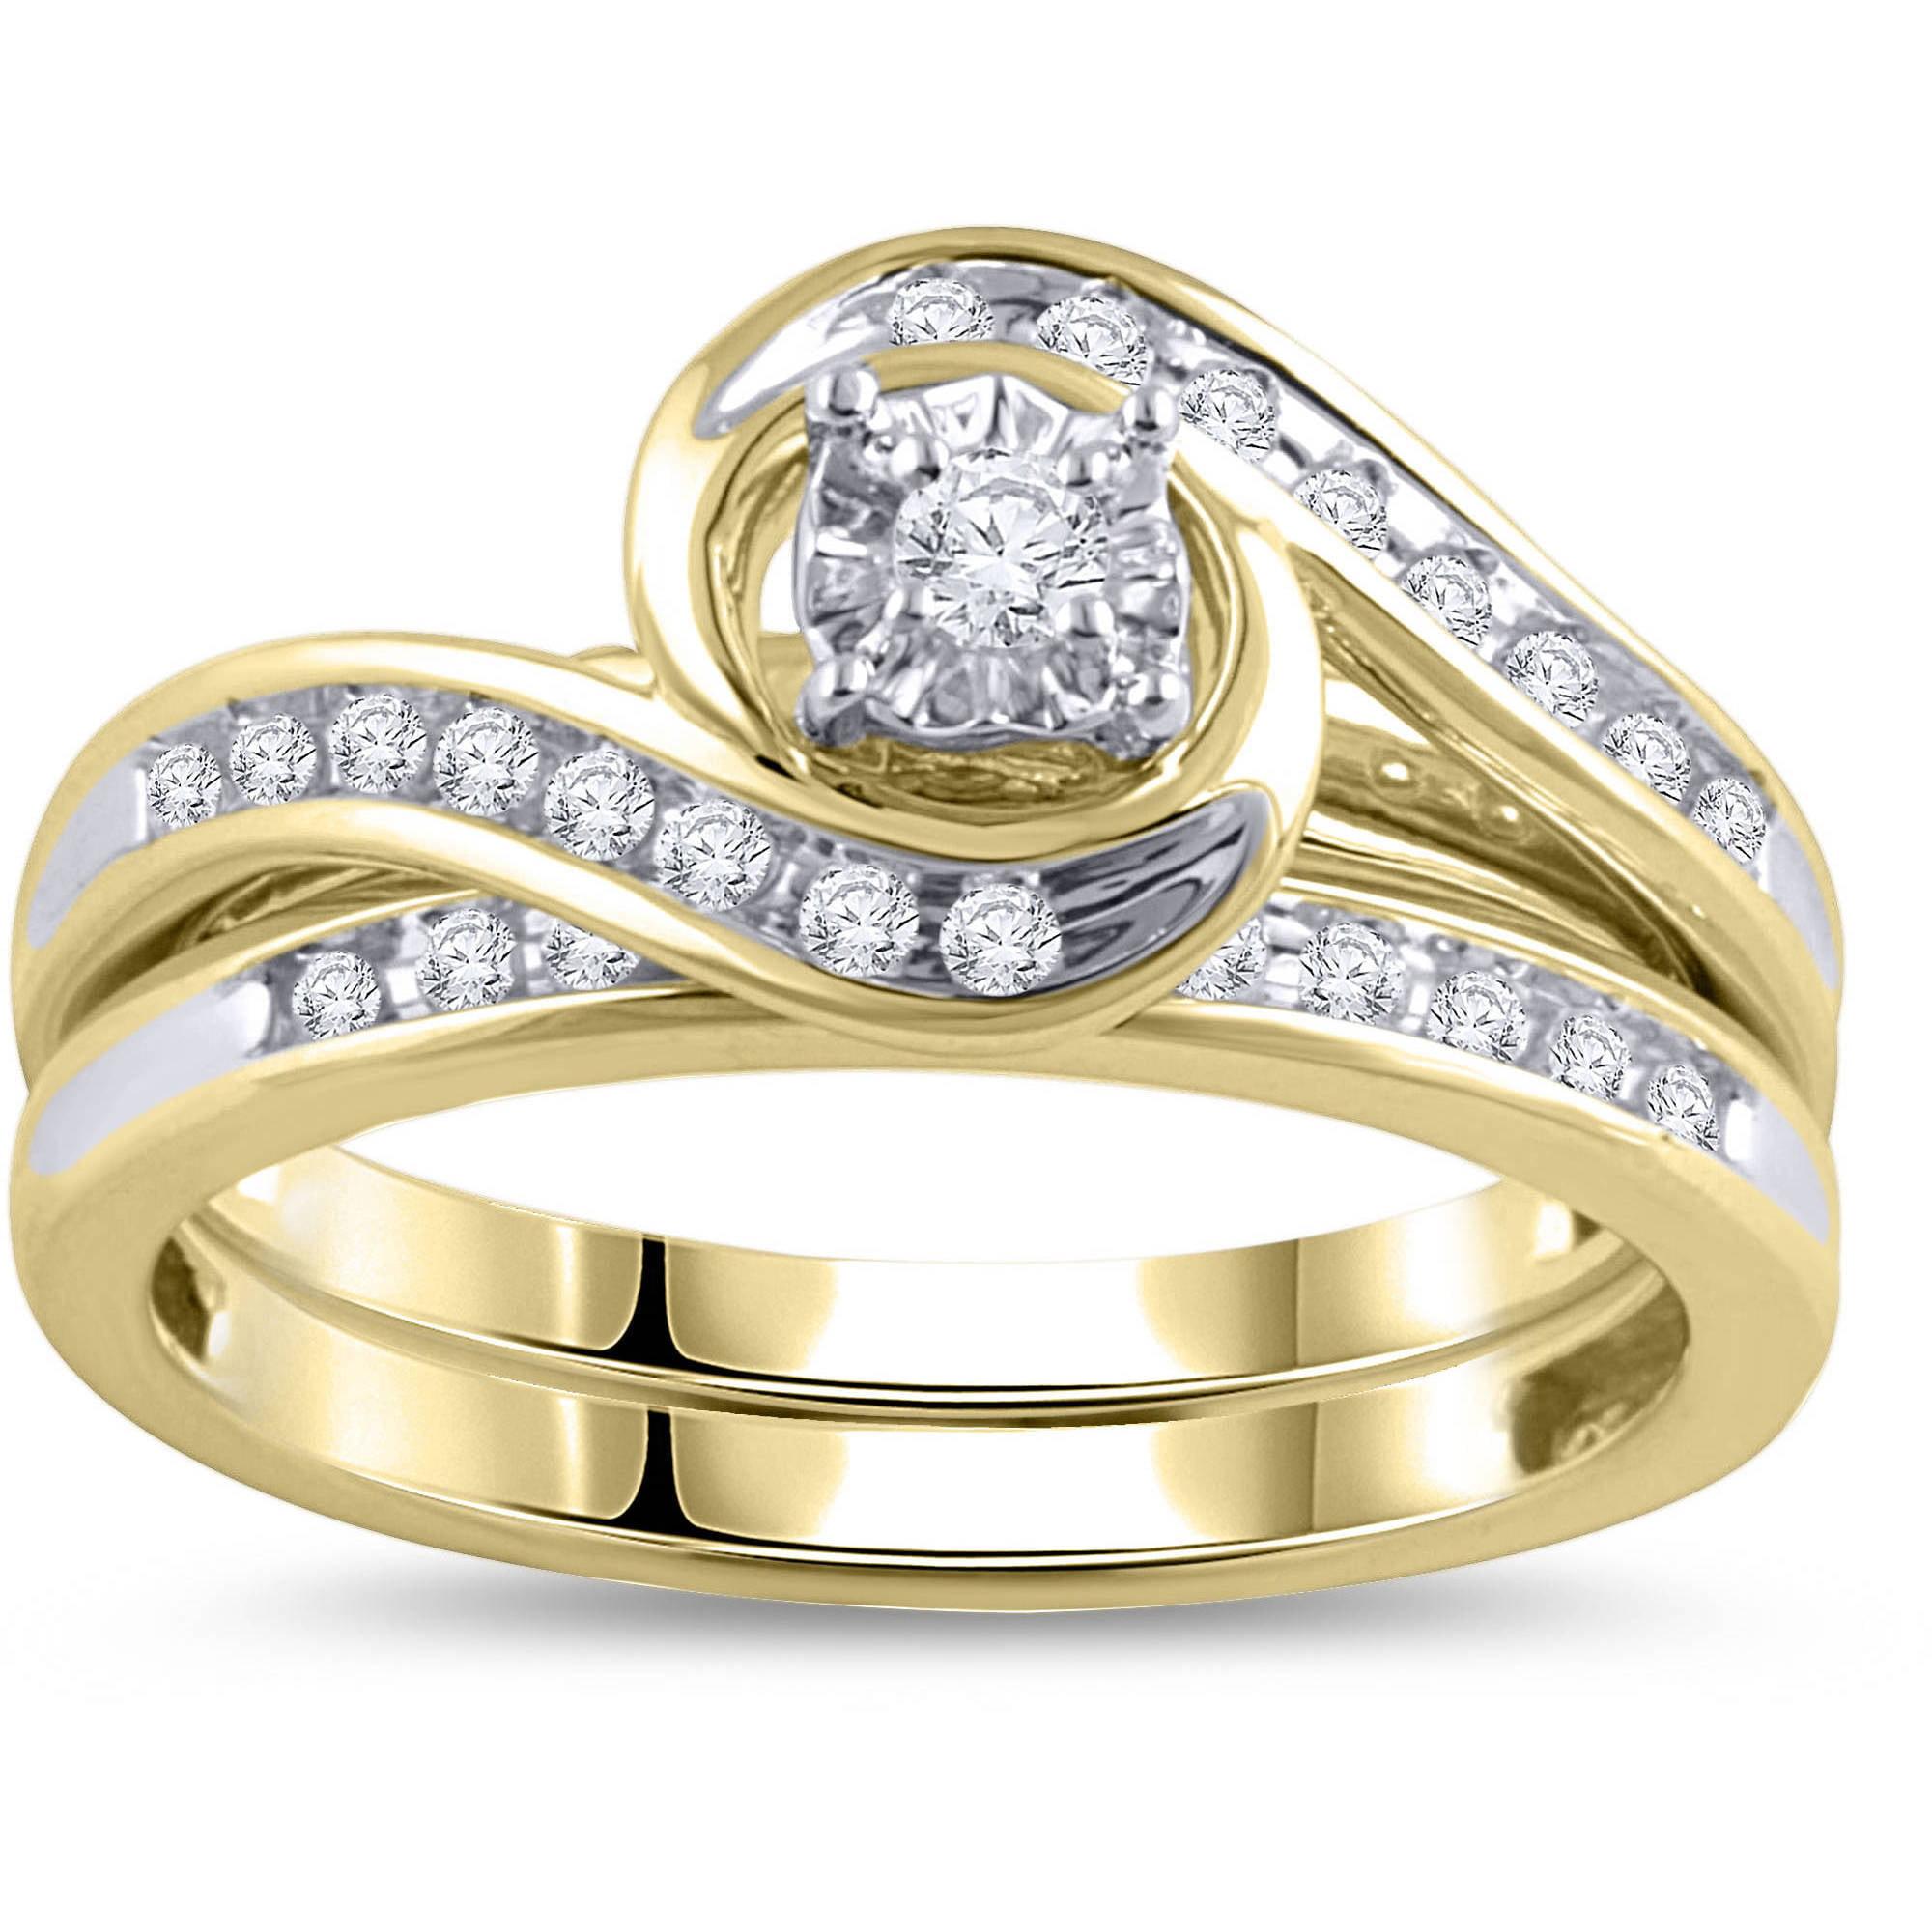 1/3 Carat Diamond Yellow Gold Bypass Bridal Ring Set